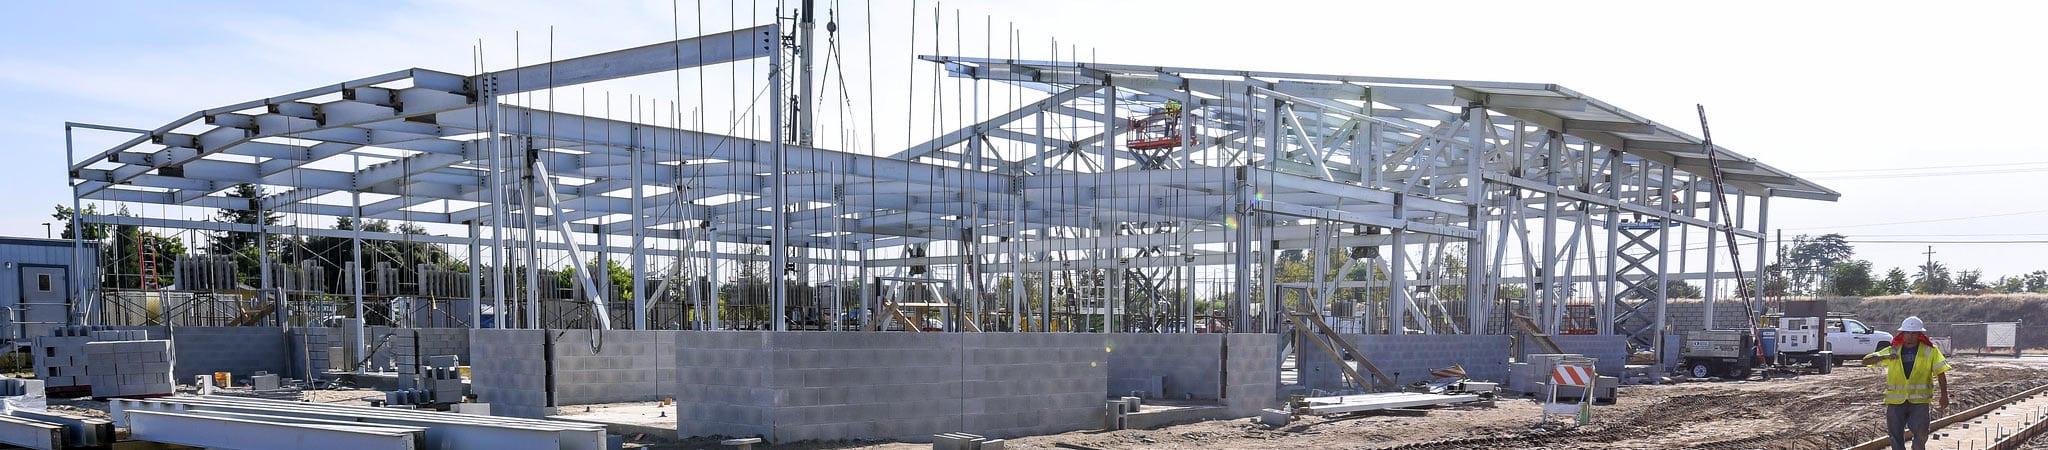 Duncan Polytechnical High School Big Truck Facility Construction in progres